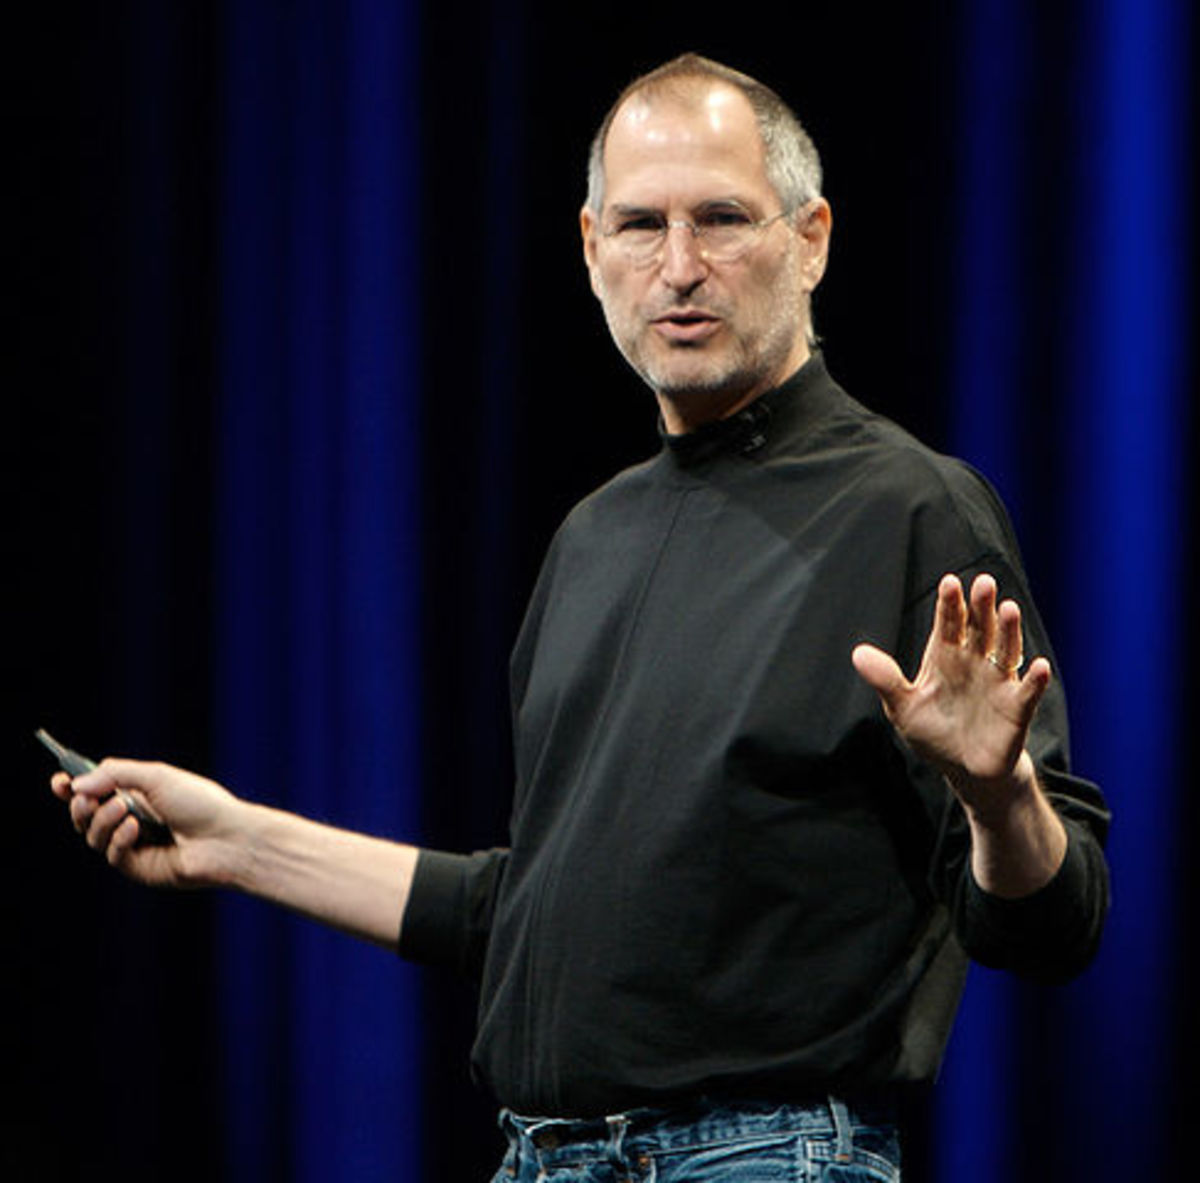 Steve Jobs at WWDC 2007